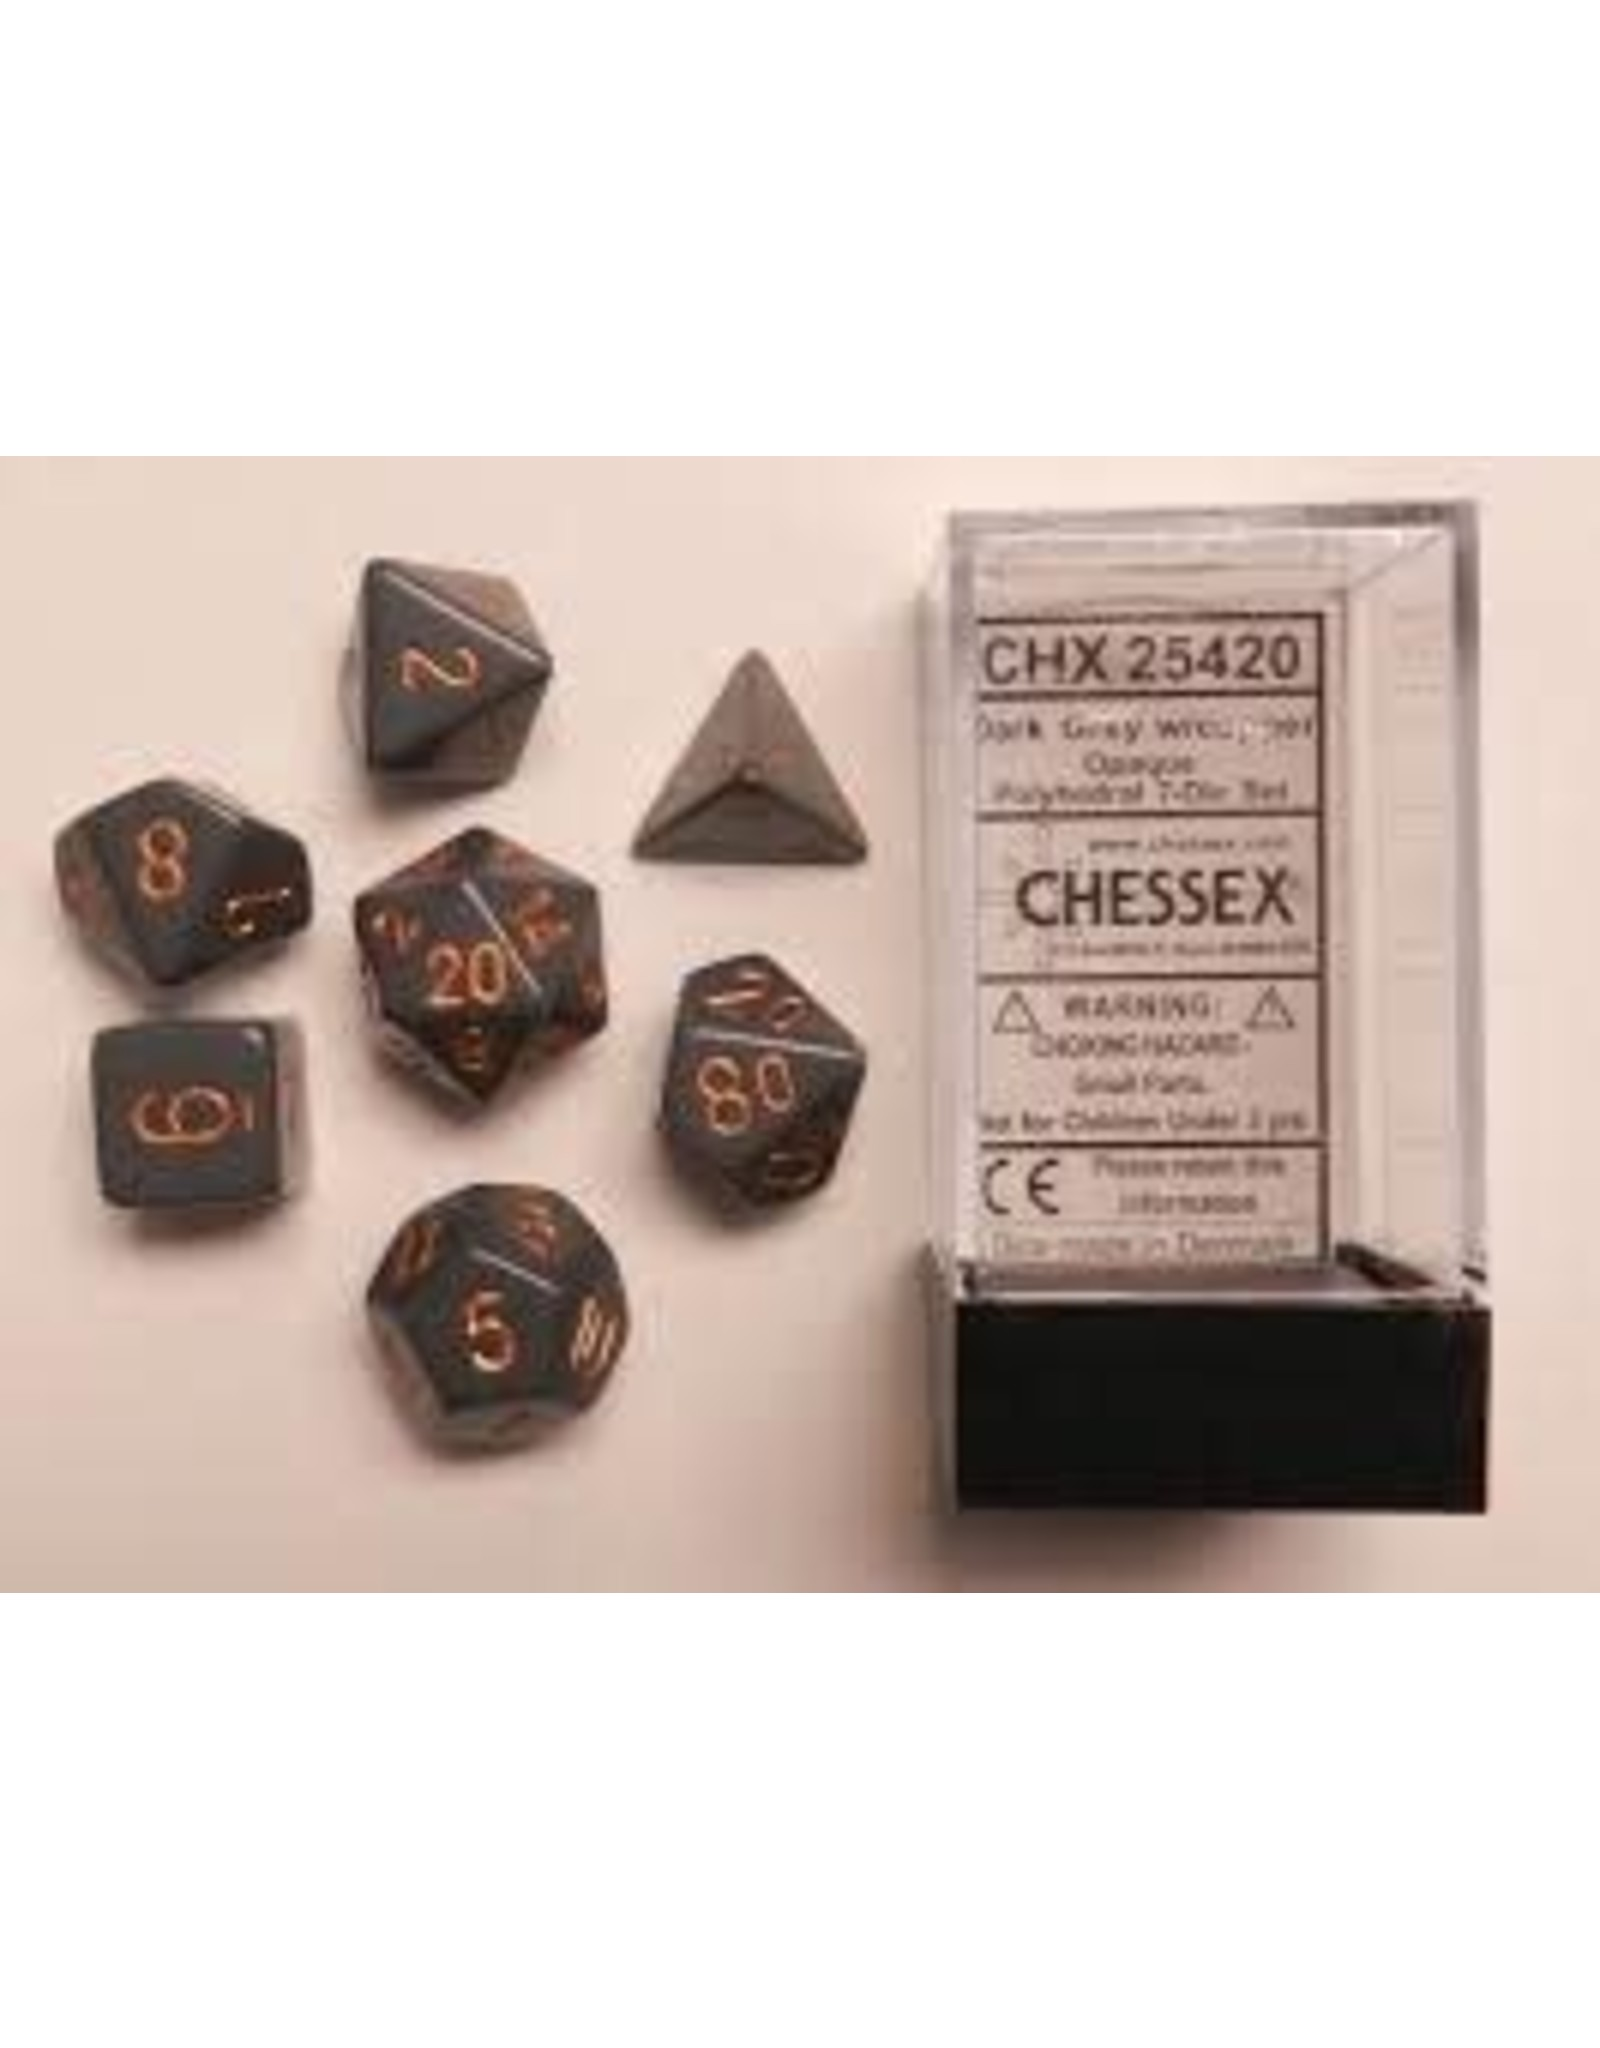 CHESSEX CHX 25420 7 PC POLY DICE SET OPAQUE DARK GREY/COPPER